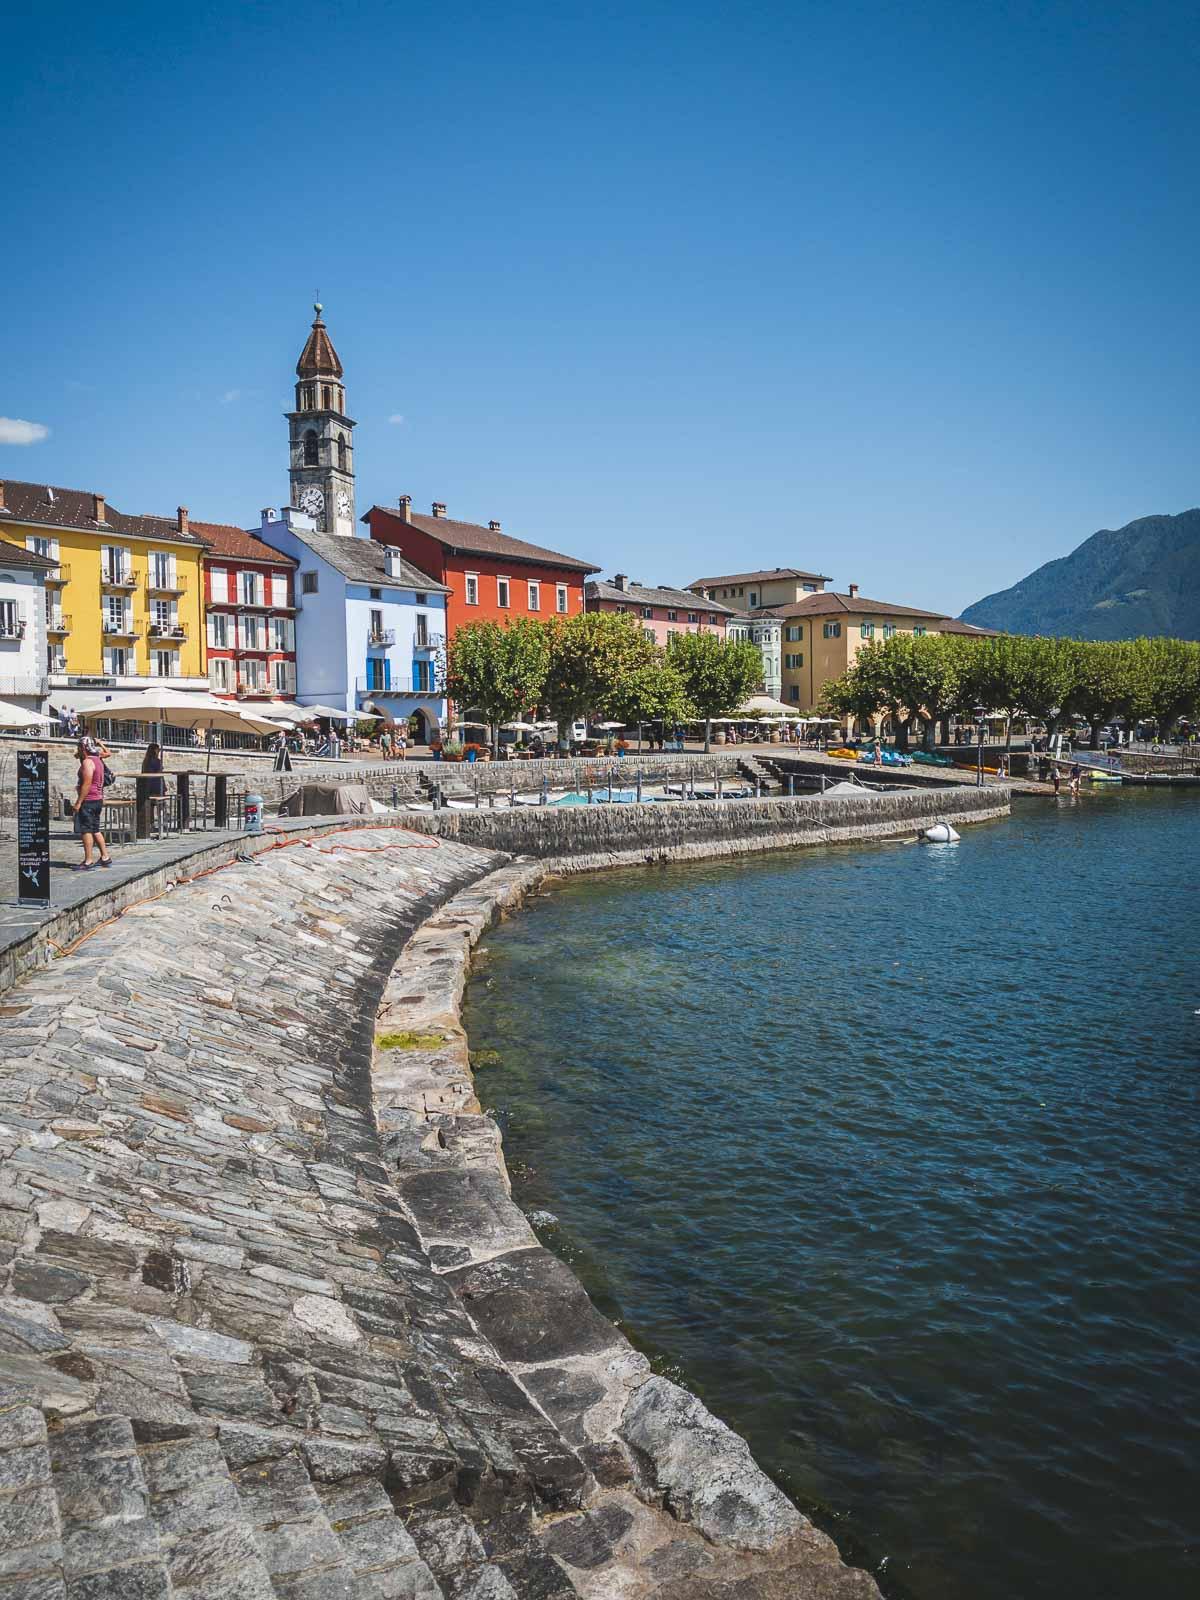 Expolring the beautiful Ascona Town